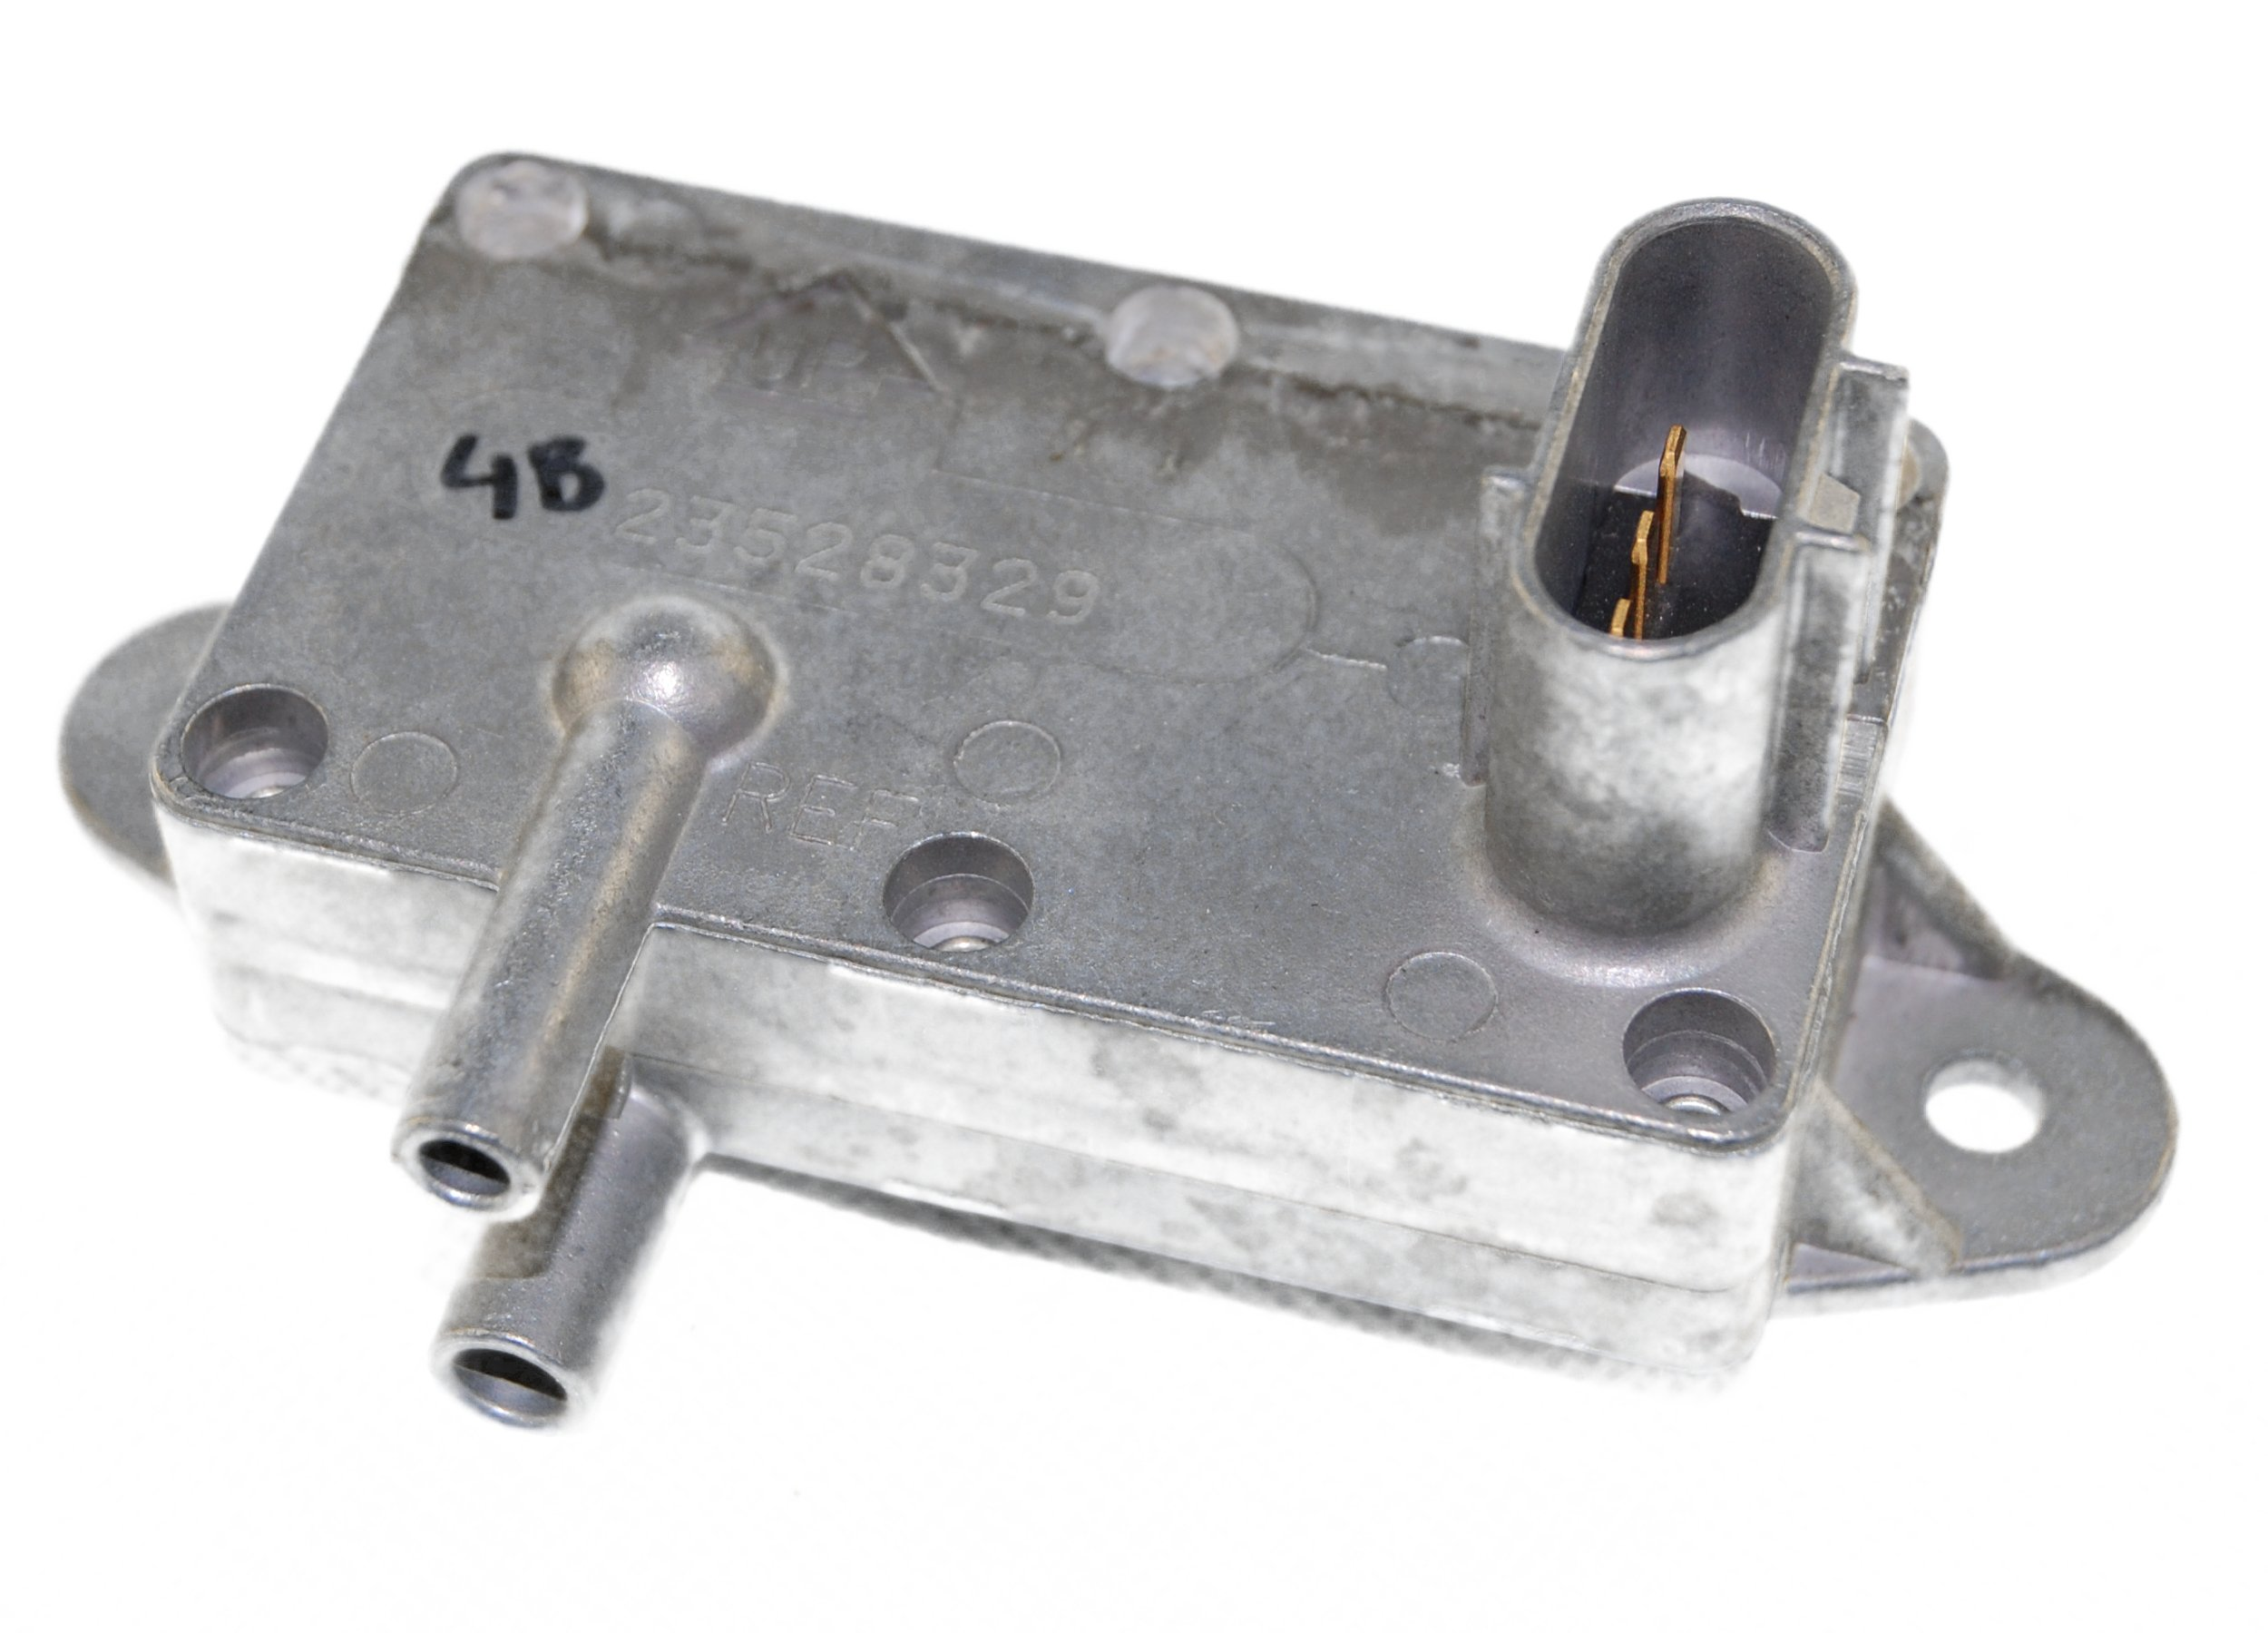 Cheap Detroit Diesel 671 Tib Find Deals On Freightliner Fuel Filter Wrench Get Quotations 23528329 Delta Pressure Sensor